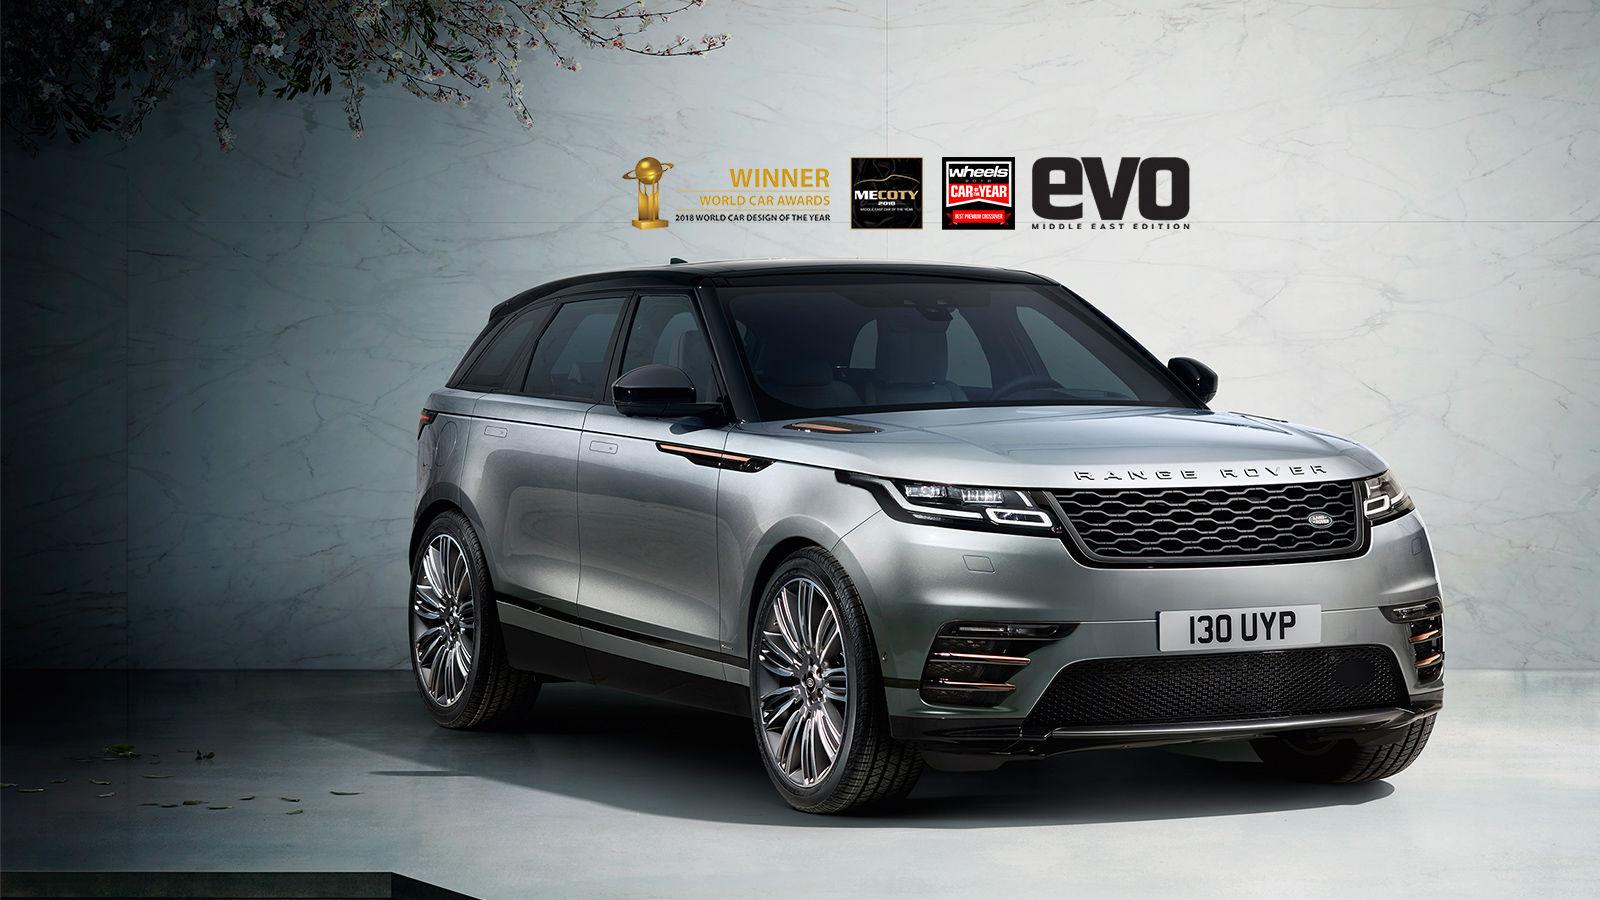 Range Rover Velar - Luxurious Compact SUV | Landrover Jordan